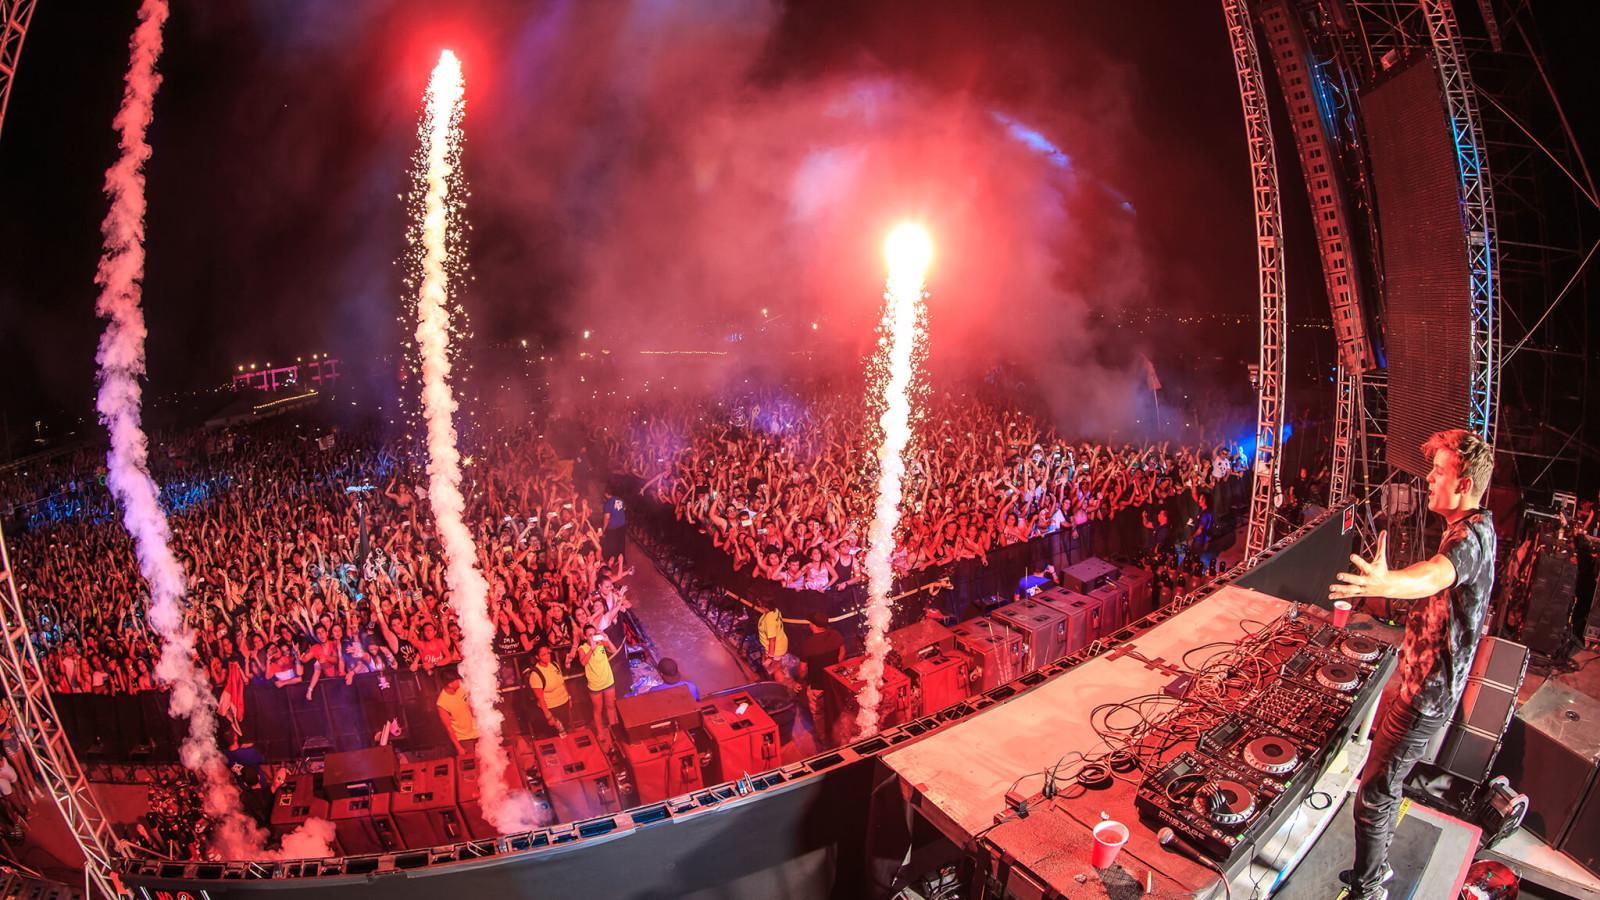 Martin Garrix performing at Sun City Music Festival 2014